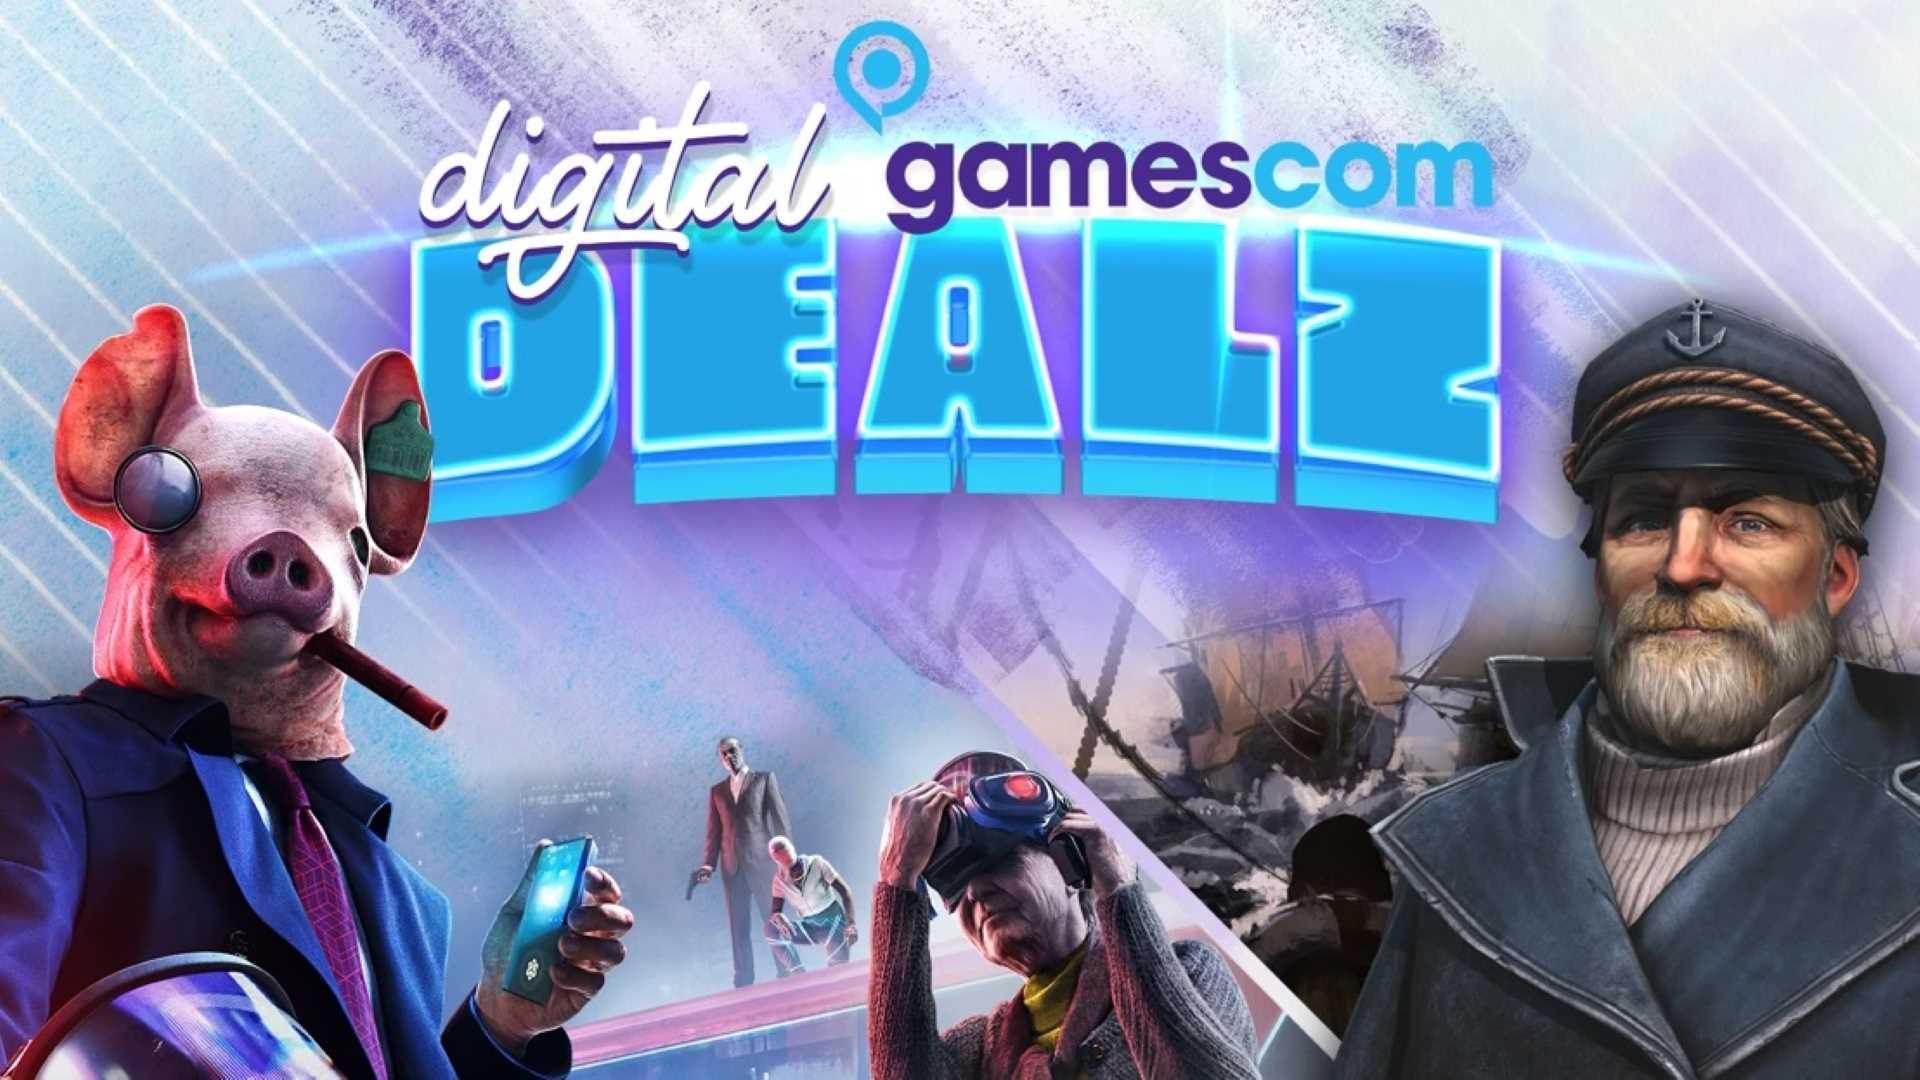 Digital gamescom Dealz Ubisoft Store - Key Art